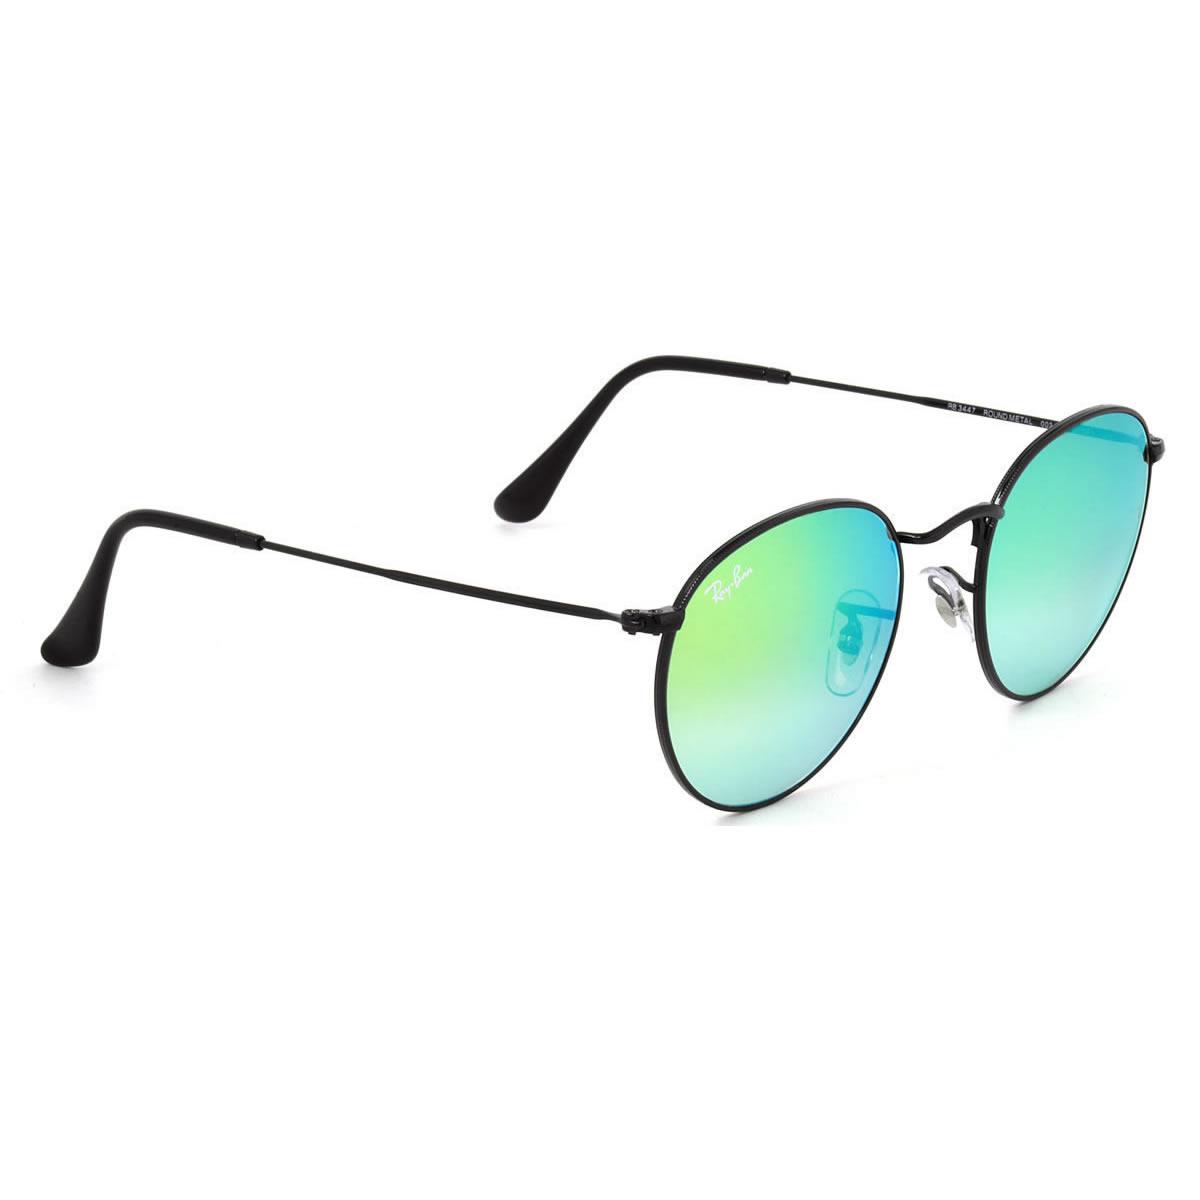 17867022a5802 Ray-Ban sunglasses mirror round metal Ray-Ban RB3447 002 4J 50 size Ray-Ban  RAYBAN ROUND FLASH LENSES GRADIENT 0024J METAL-maru glasses mirror ICONS  icon ...